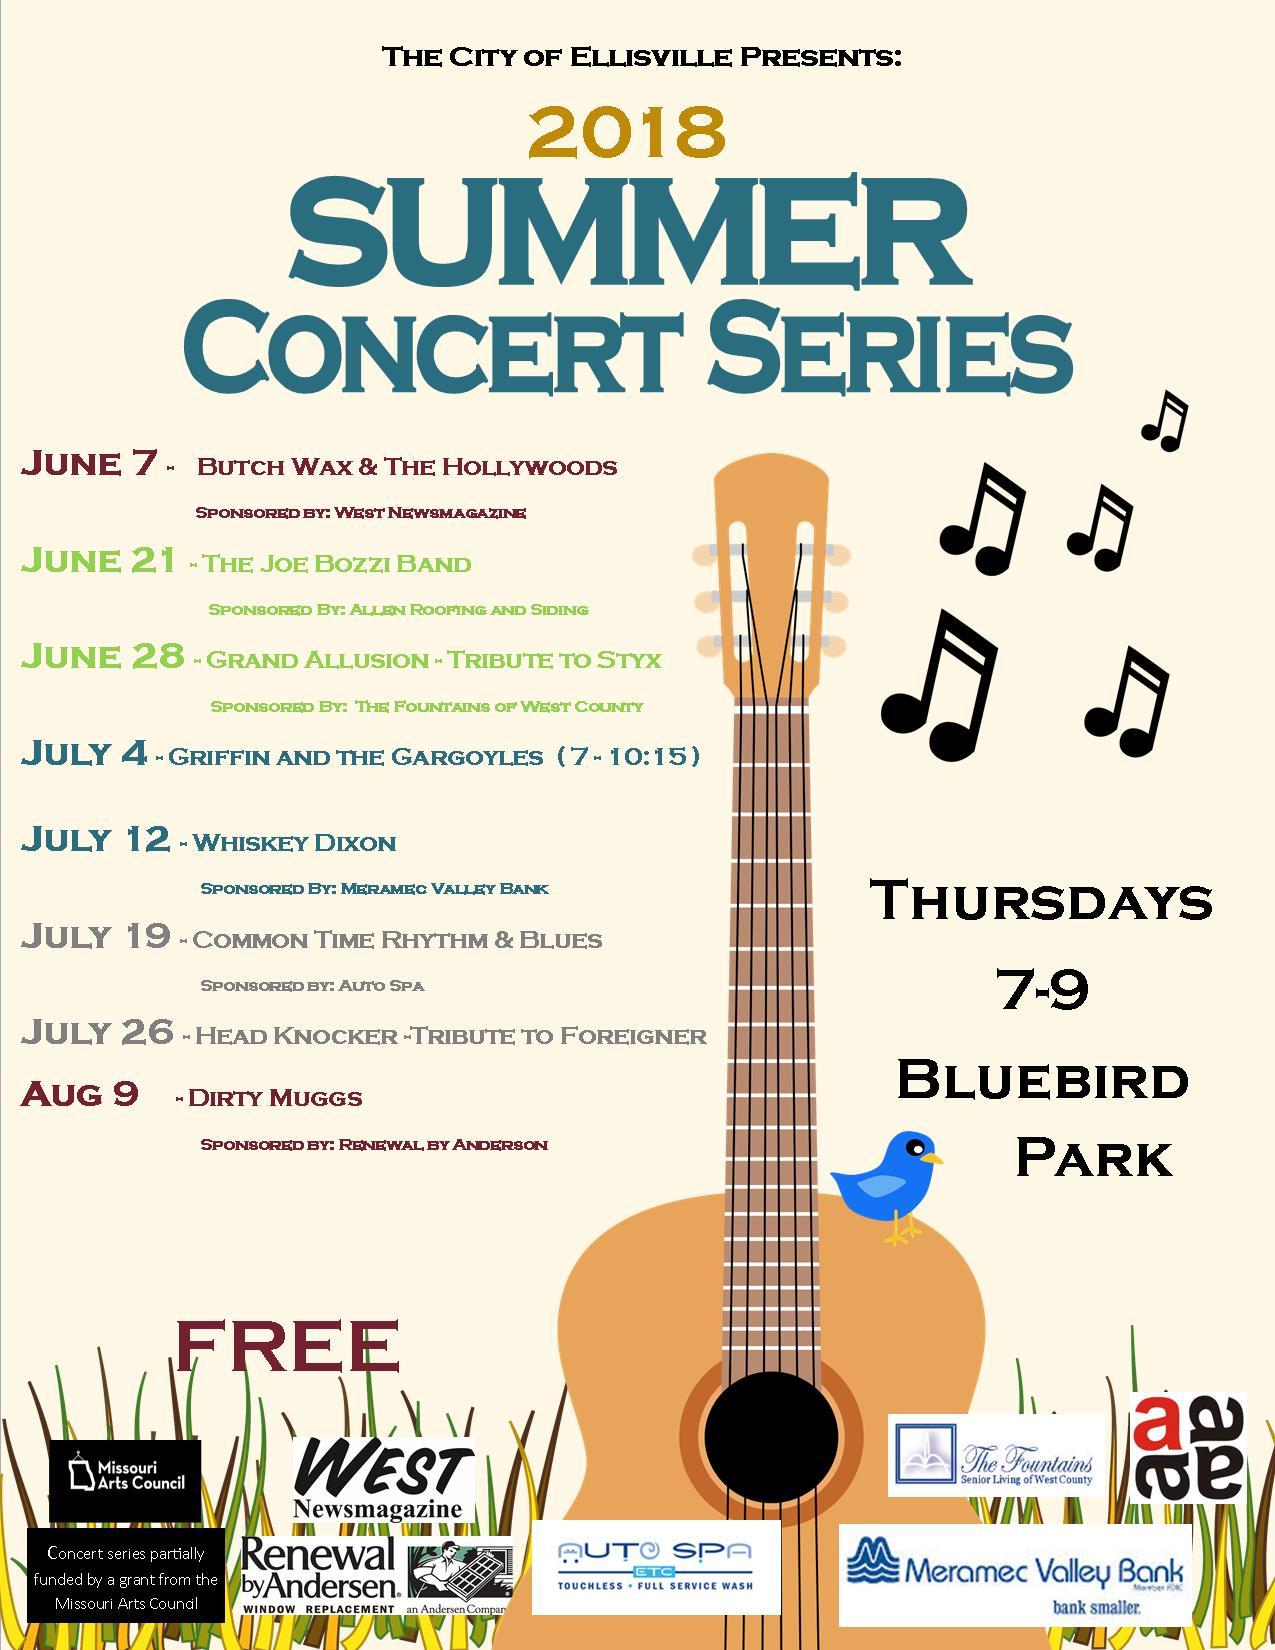 Summer Concert Series 2018 | Ellisville, MO - Official Website